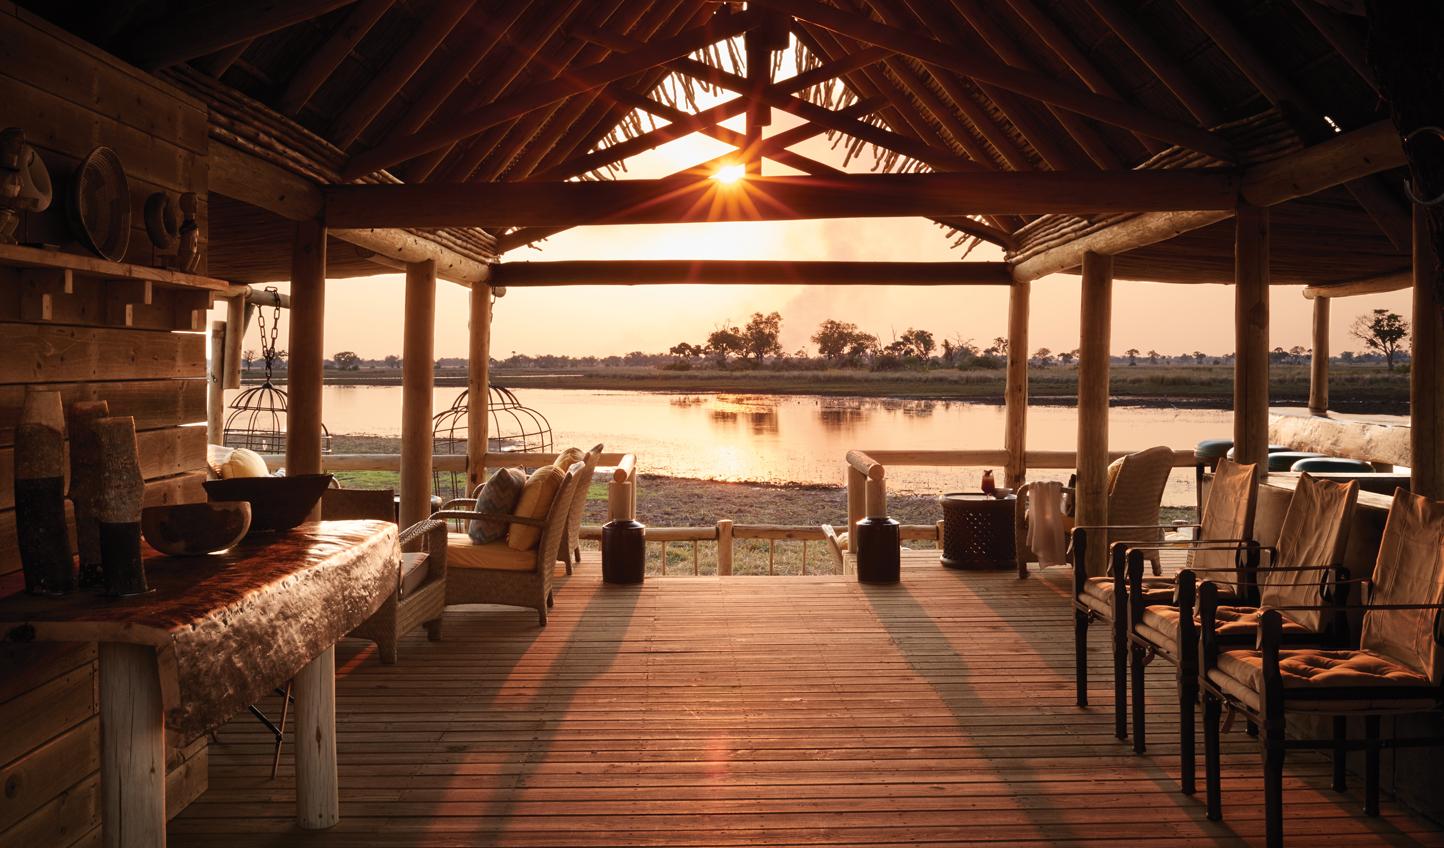 Enjoy stunning African sunsets